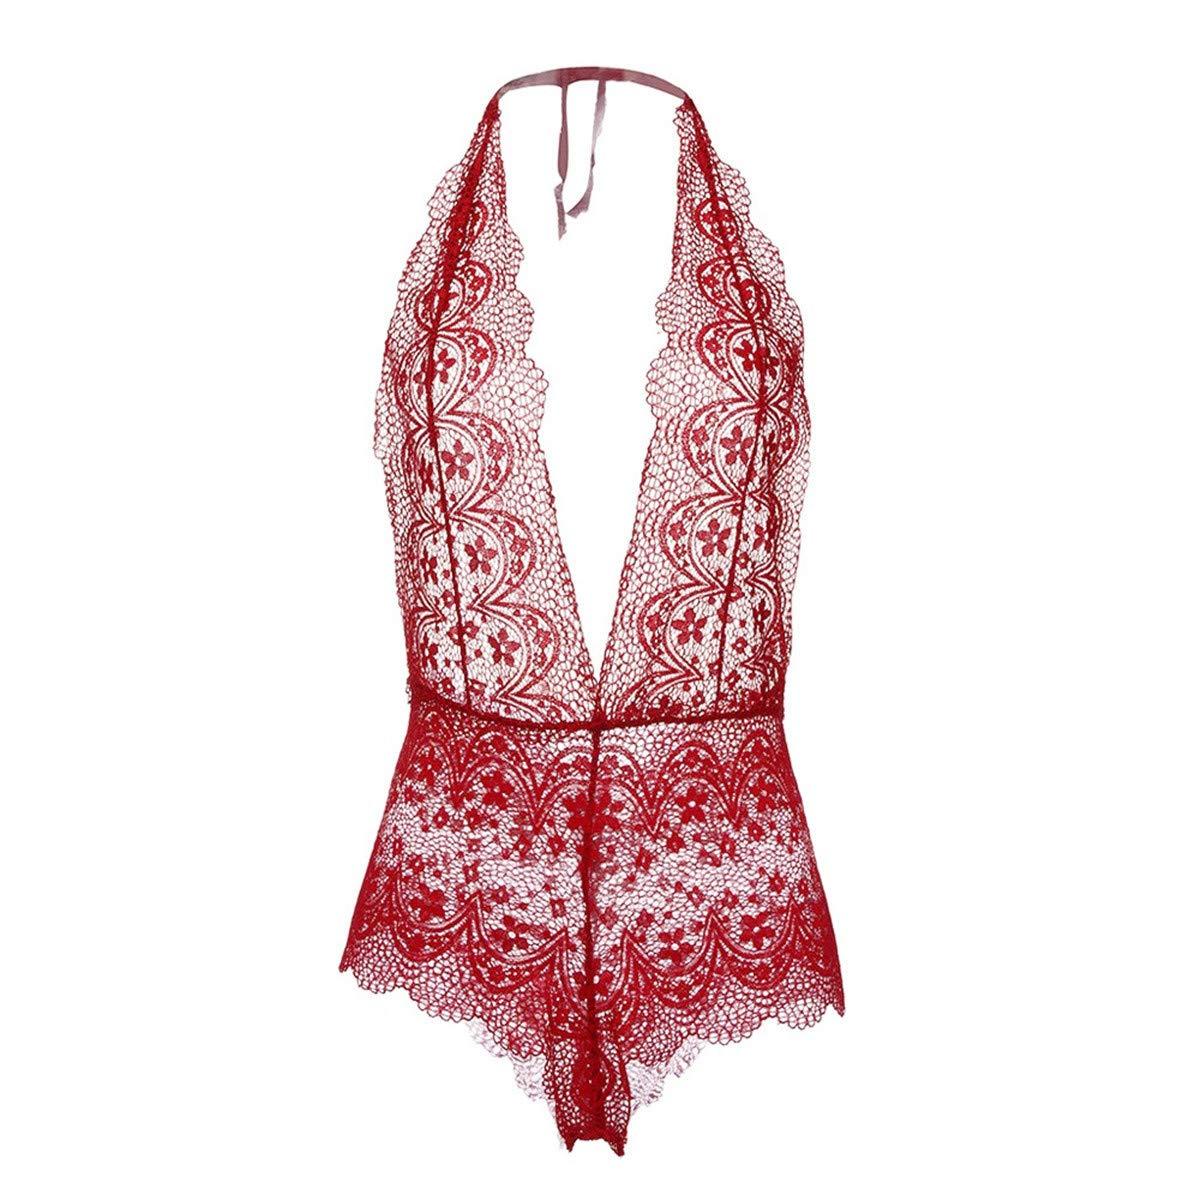 Wesracia Womens Halter Sheer Lace Teddy Babydoll for Dominatrix Lingerie Lingerie Bodysuit For Women for Sex